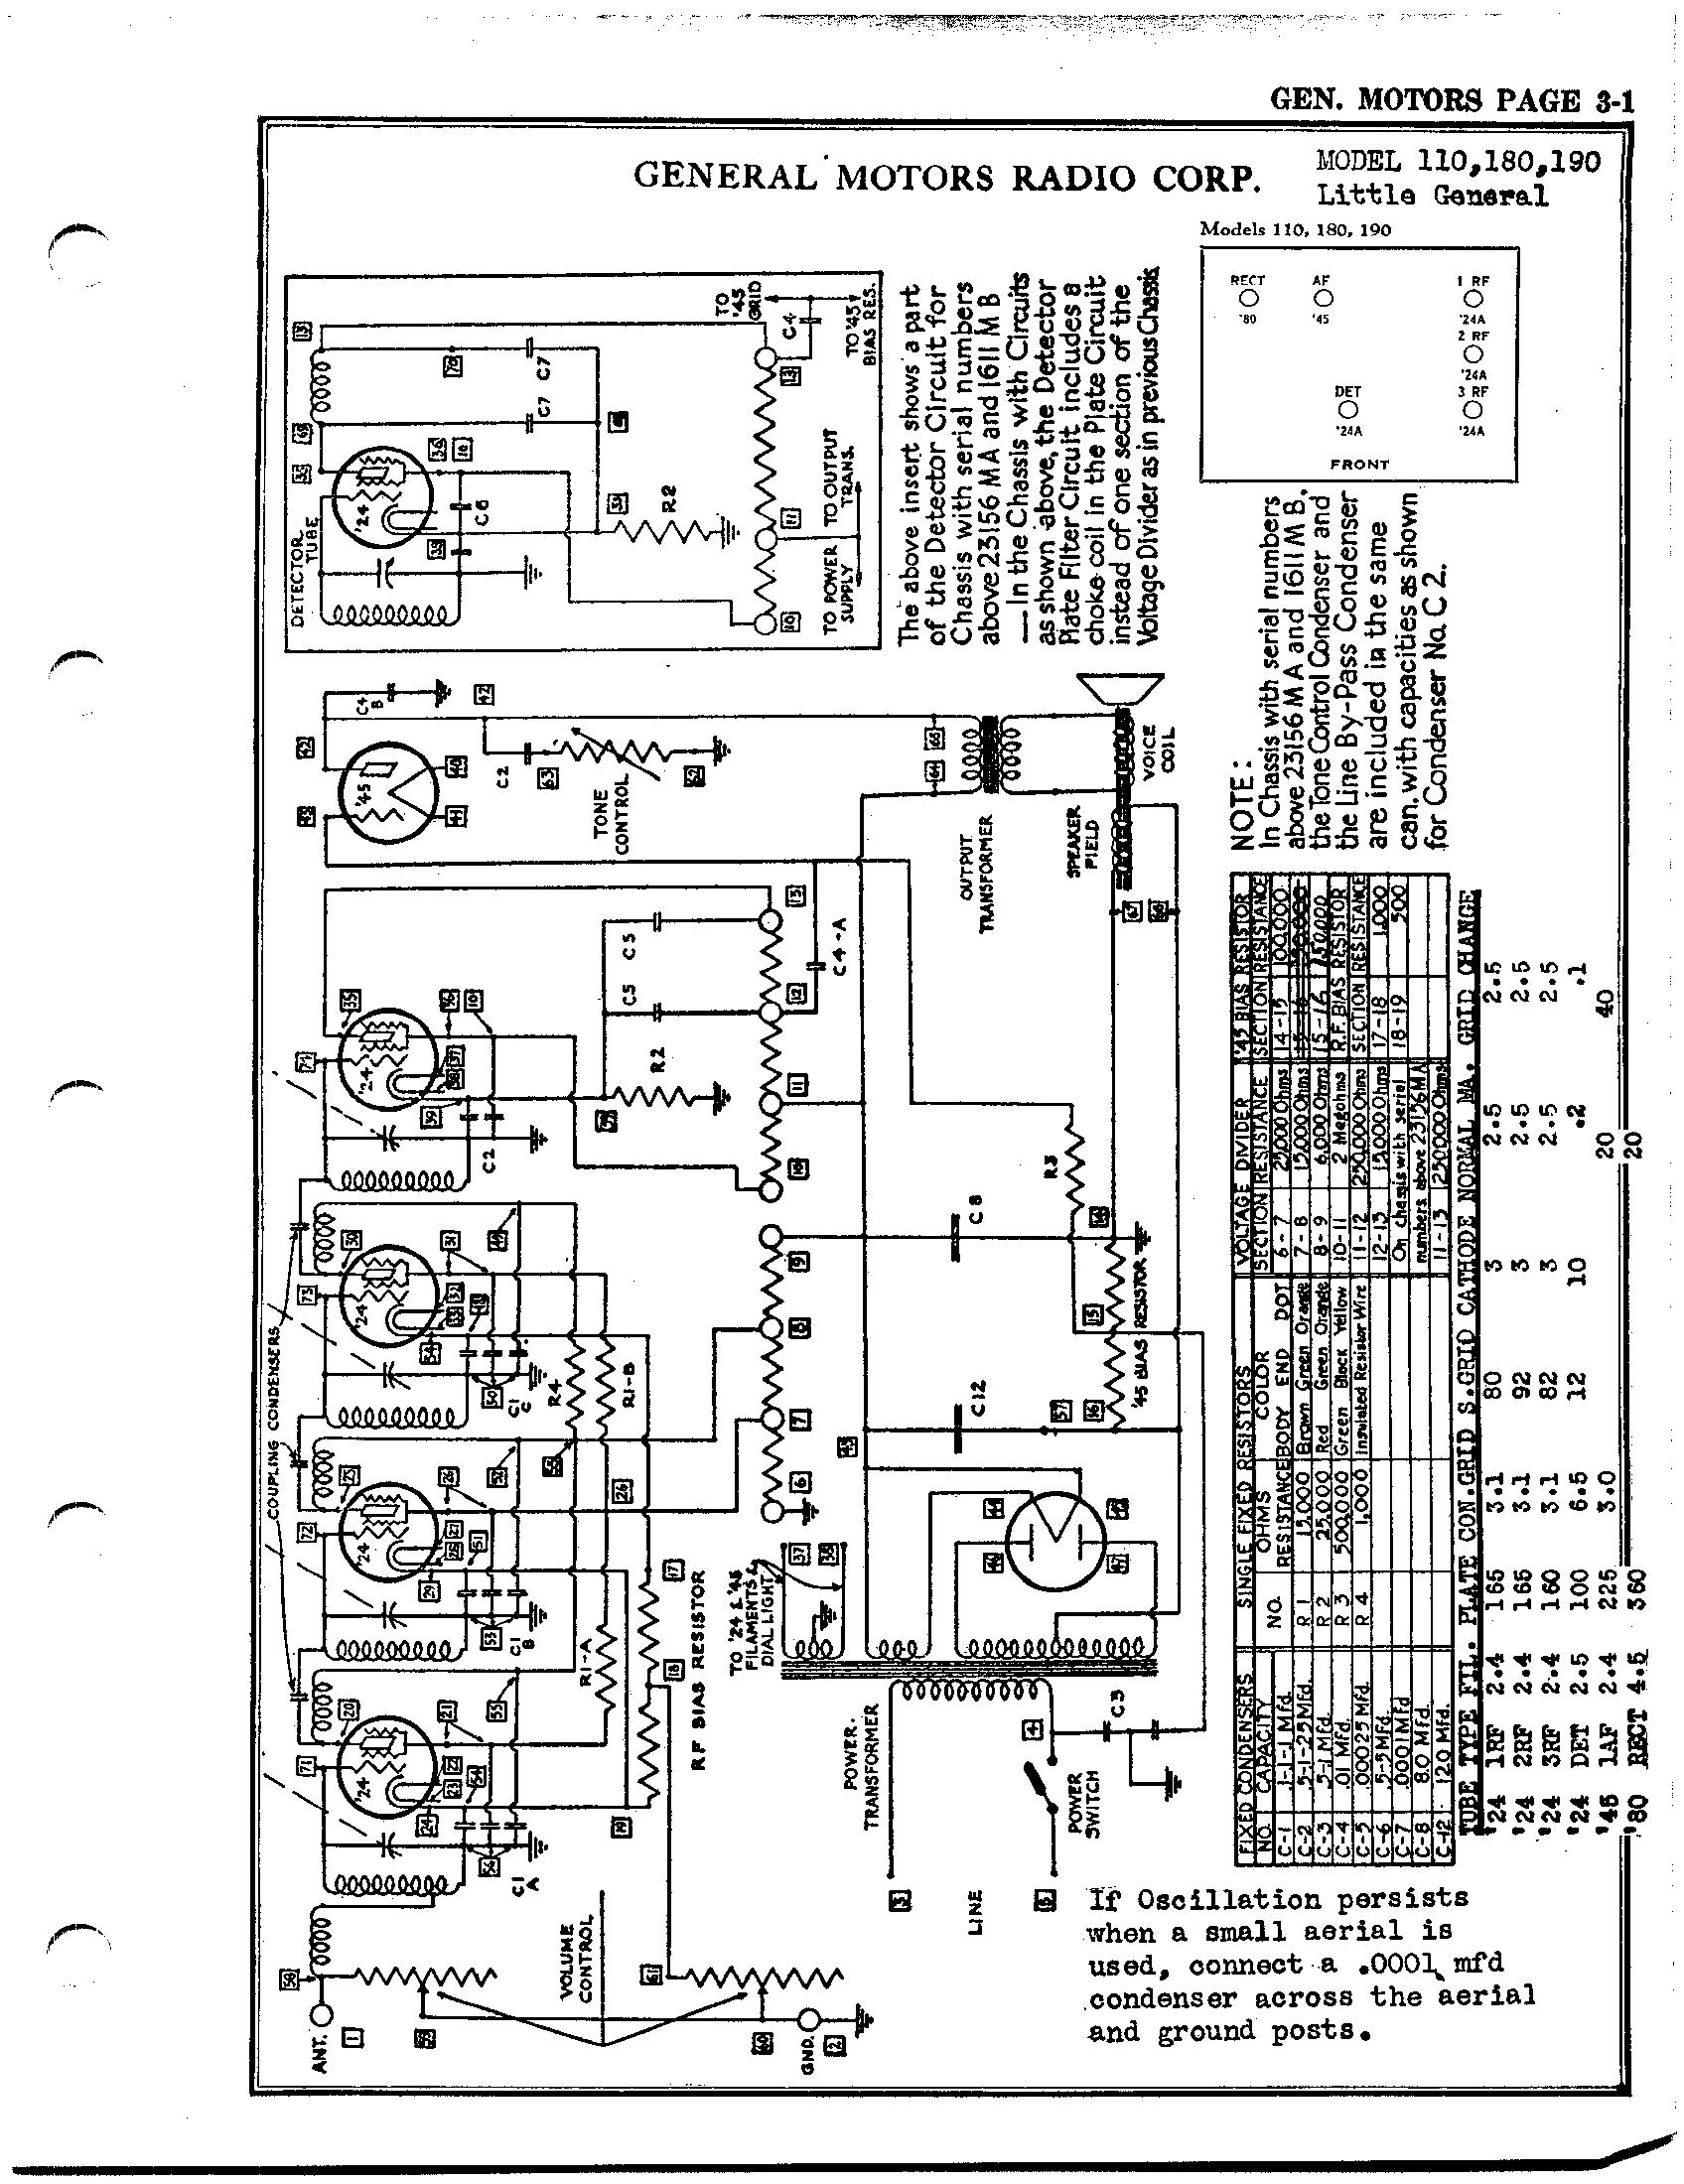 general motors radio corp  little general